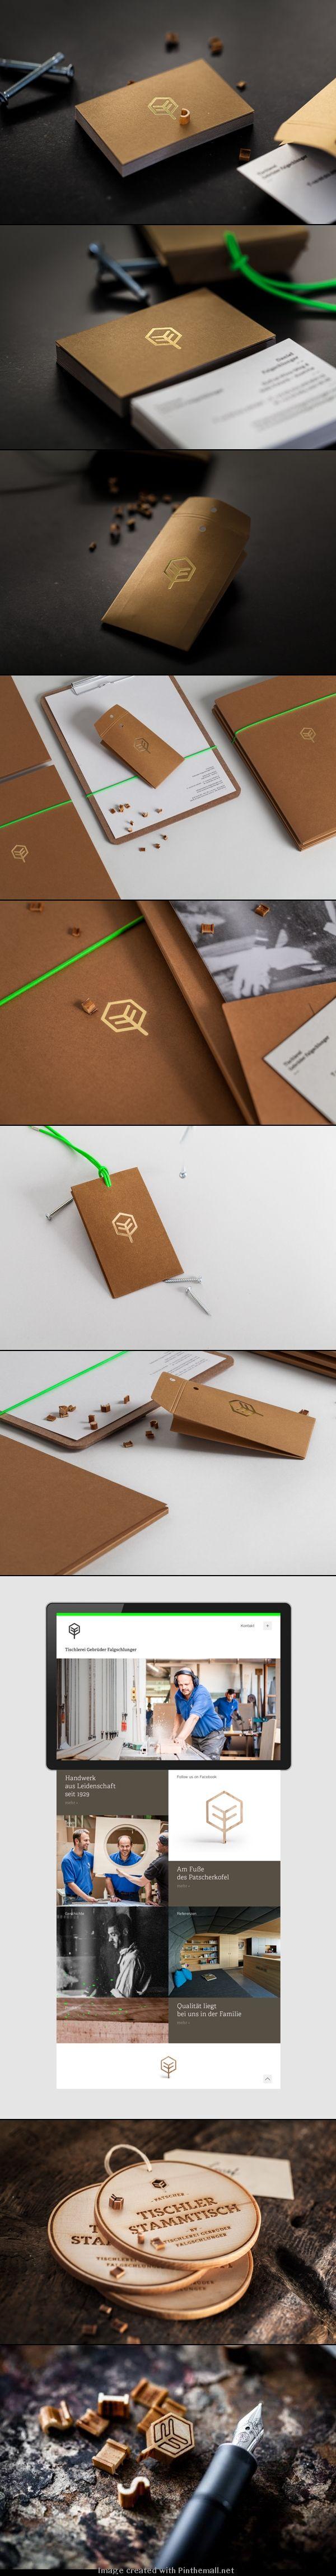 Corporate design branding graphic foil copper bronze metallic business card logo letter label tag wood accent color minimal